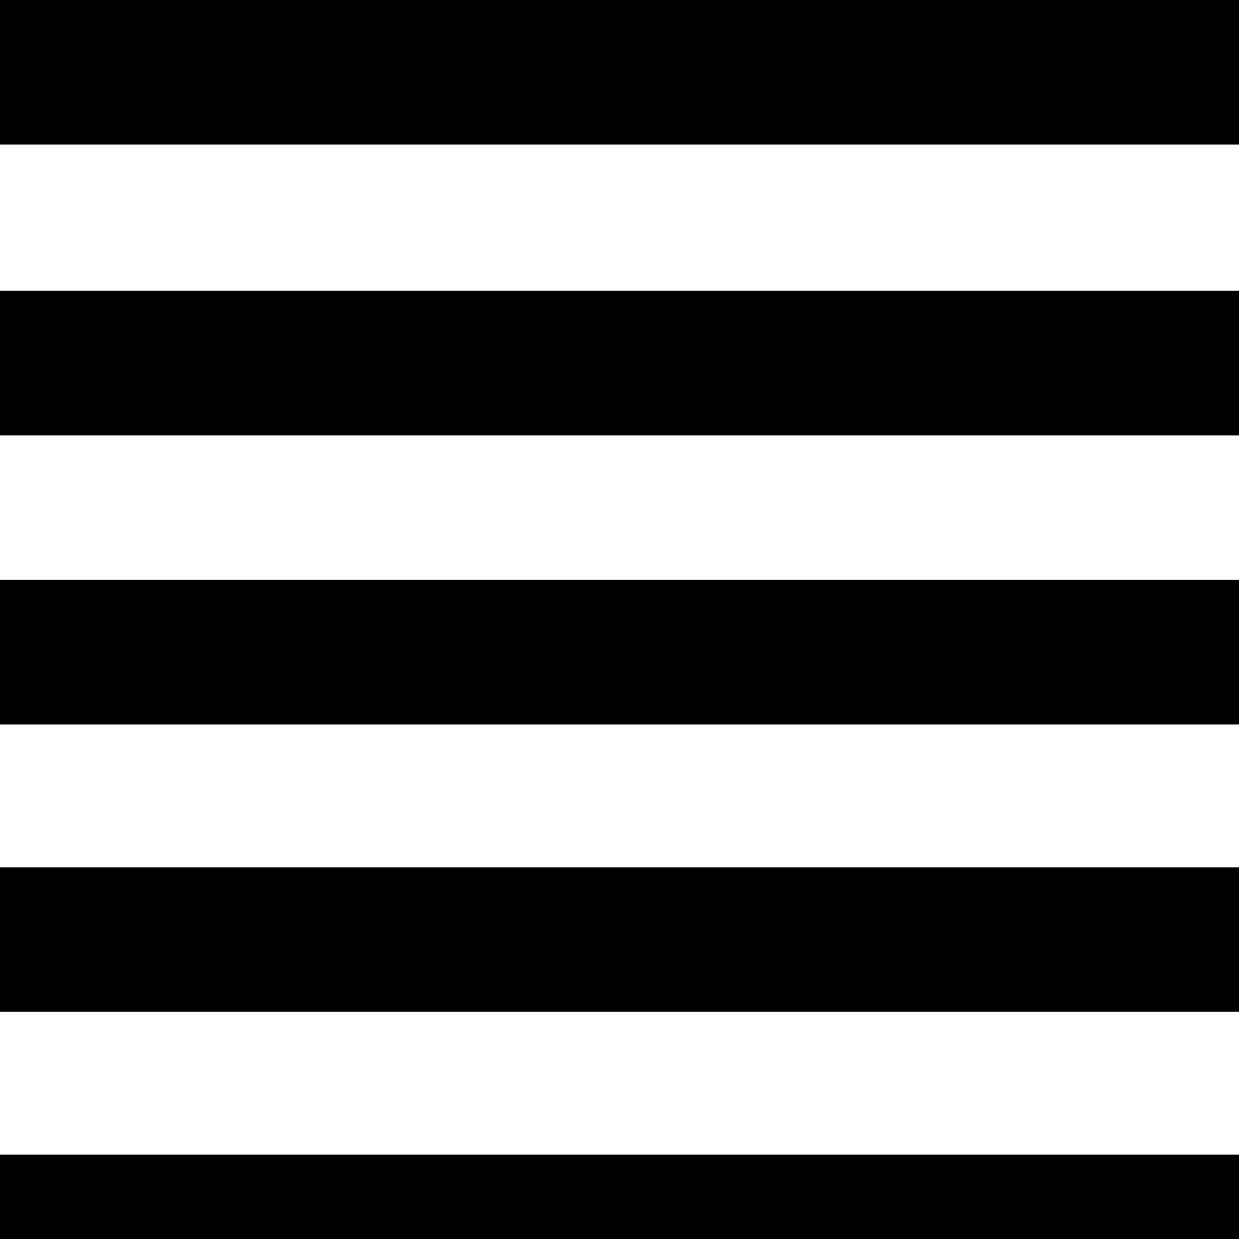 45+ Horizontal Stripe Wallpaper on WallpaperSafari